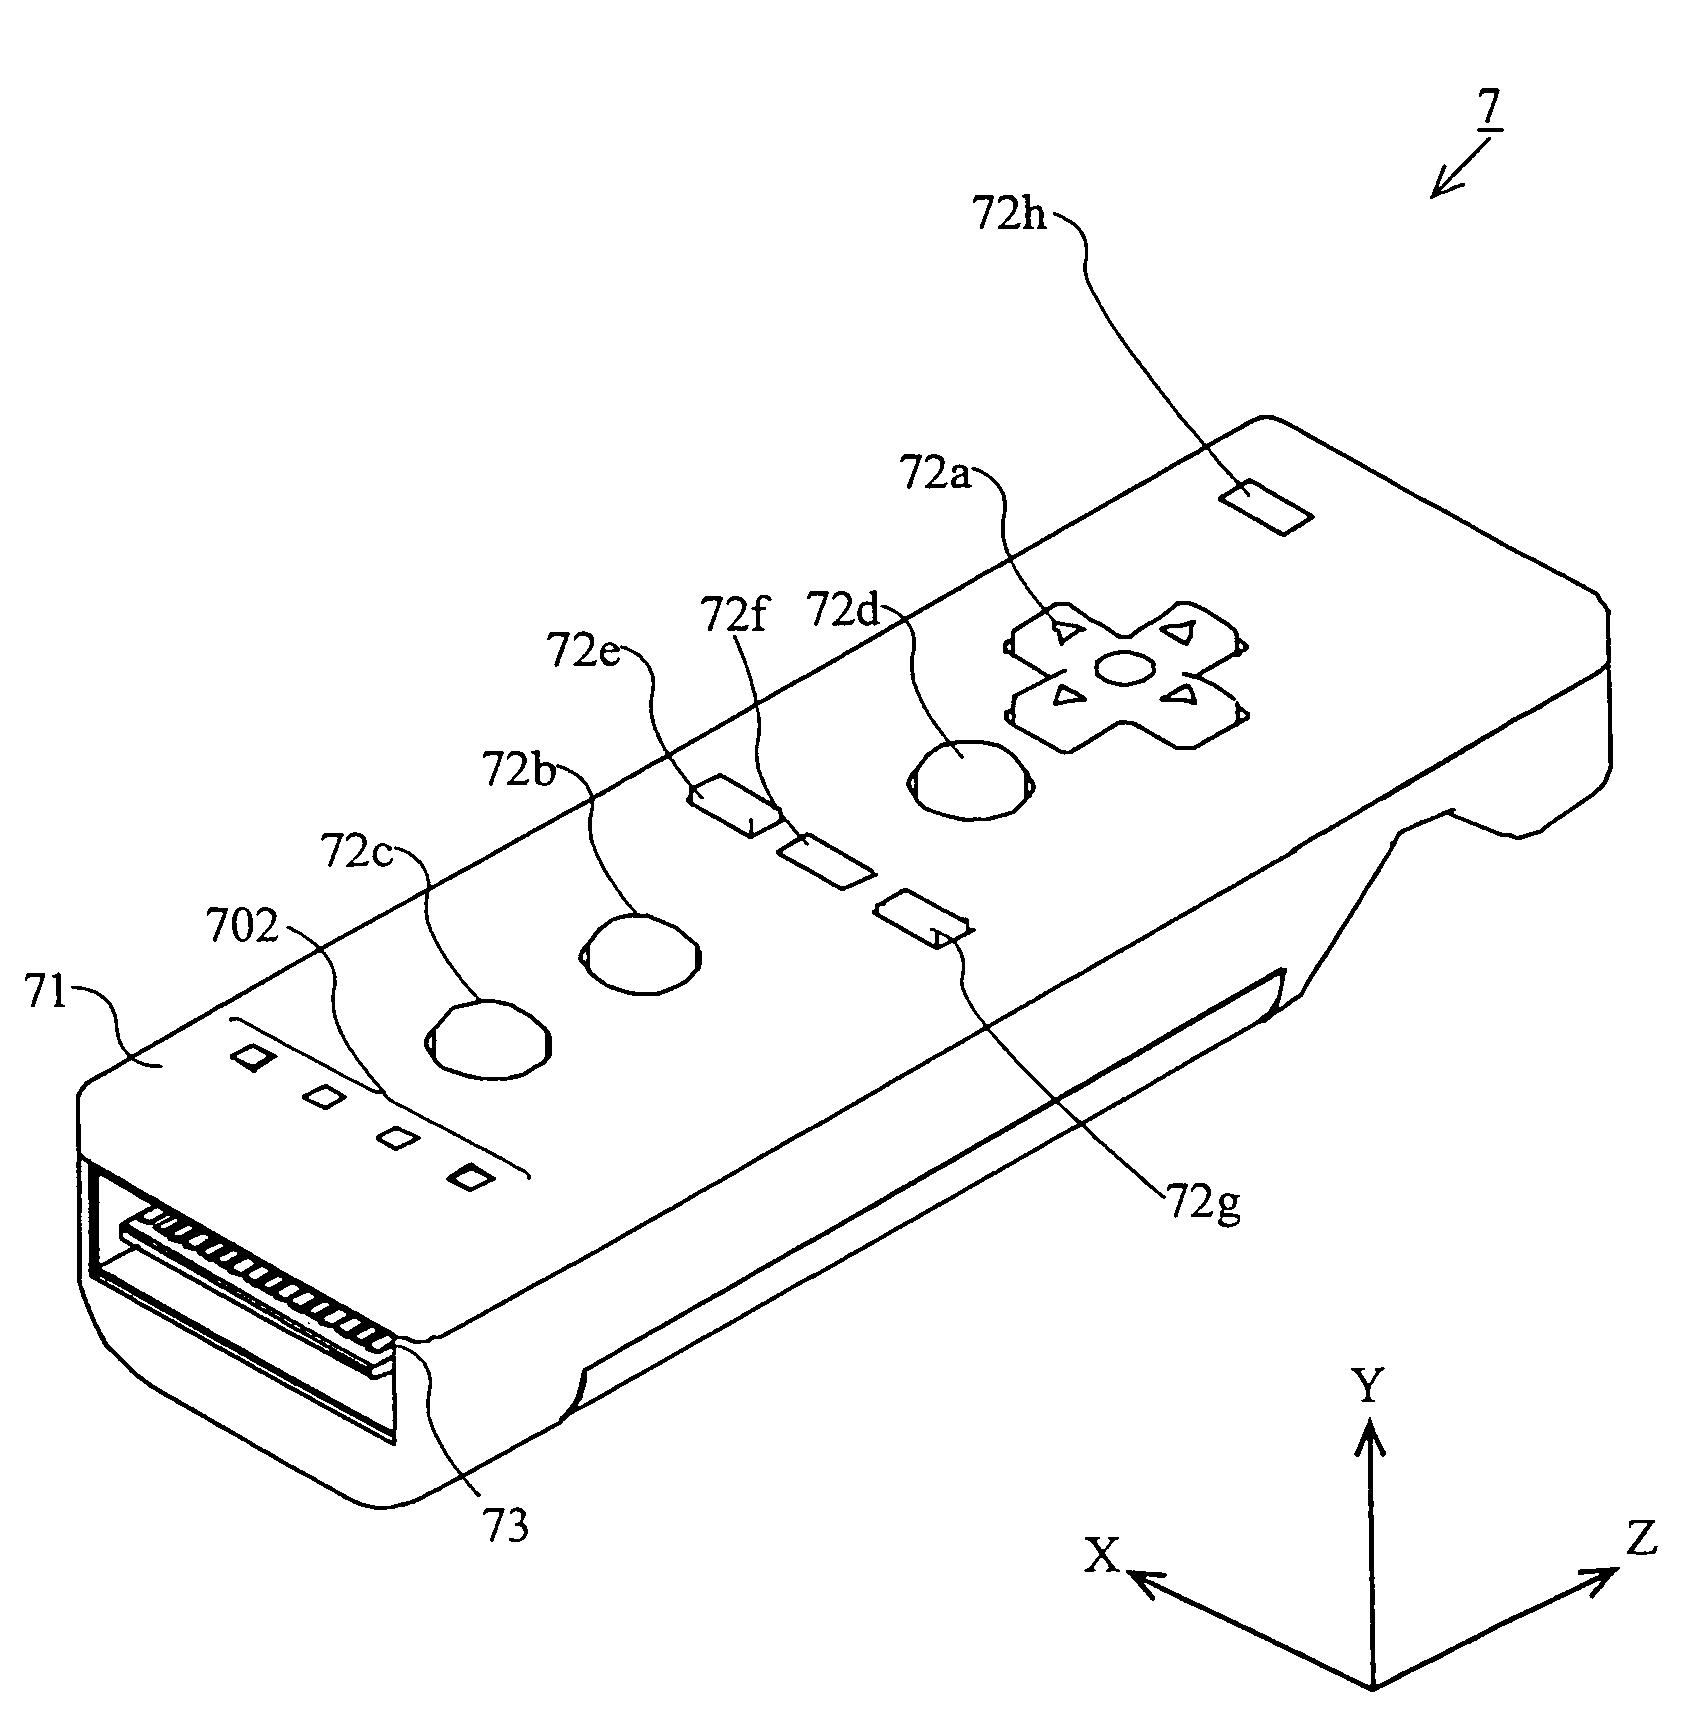 patent us7774155 - accelerometer-based controller